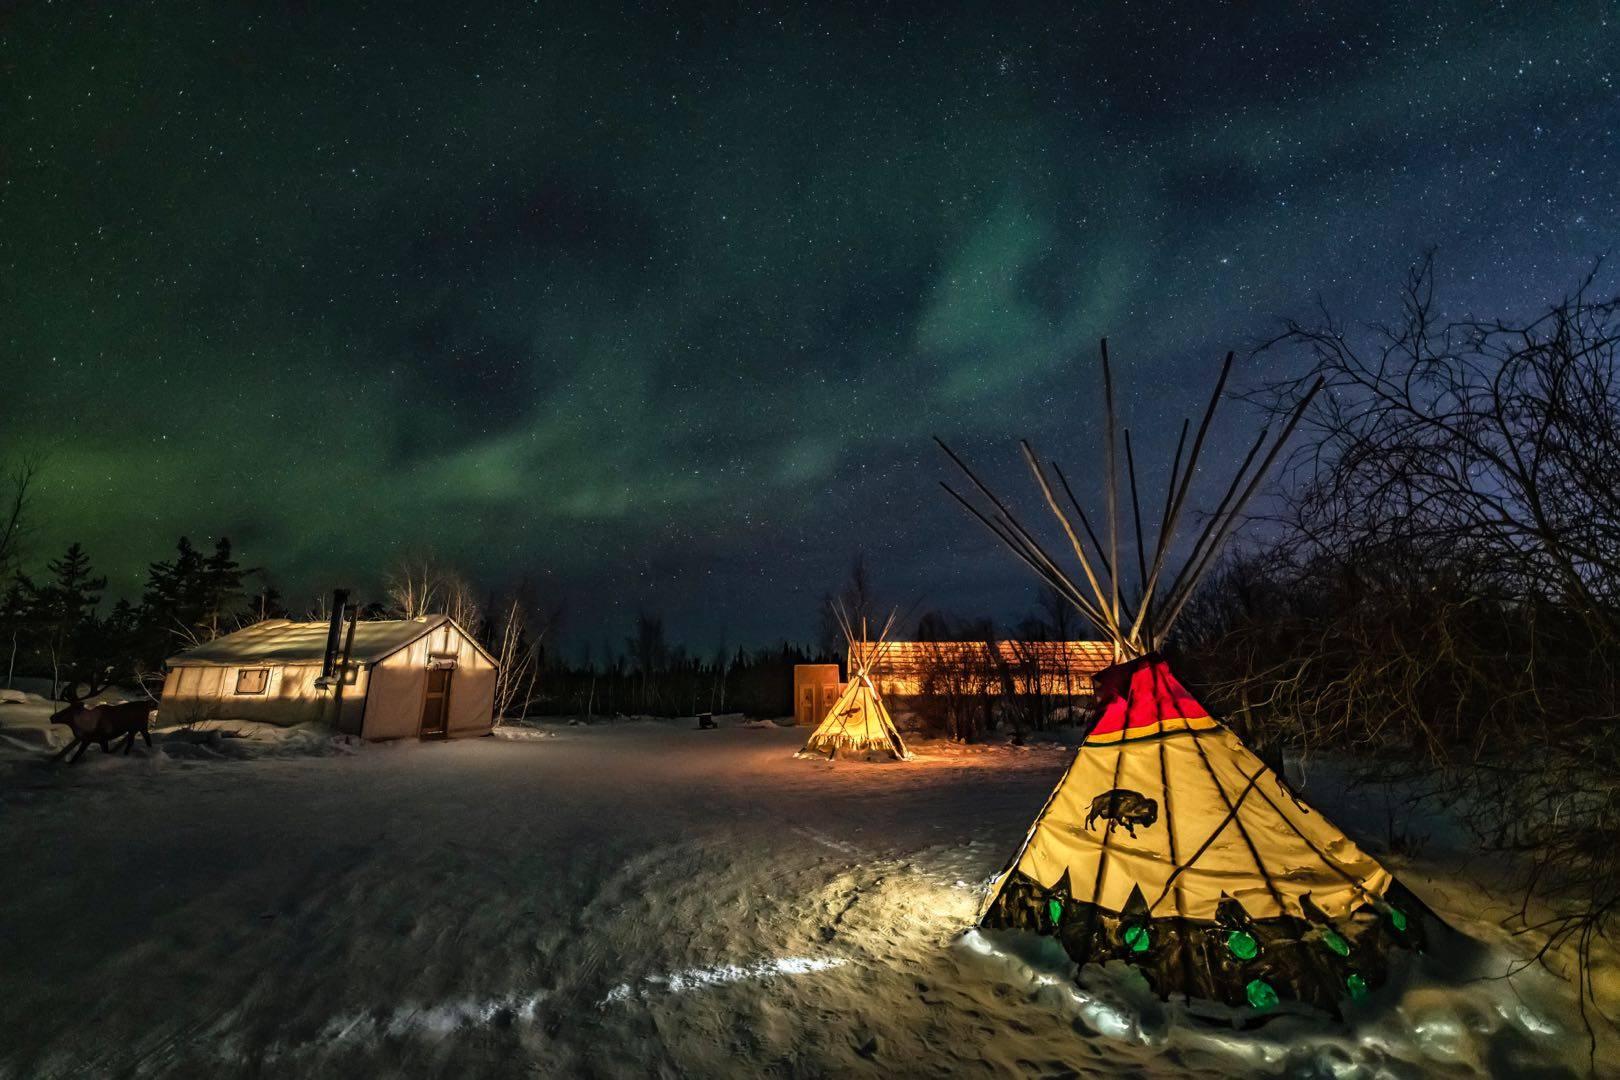 4-Day Yellowknife Aurora Viewing Tour